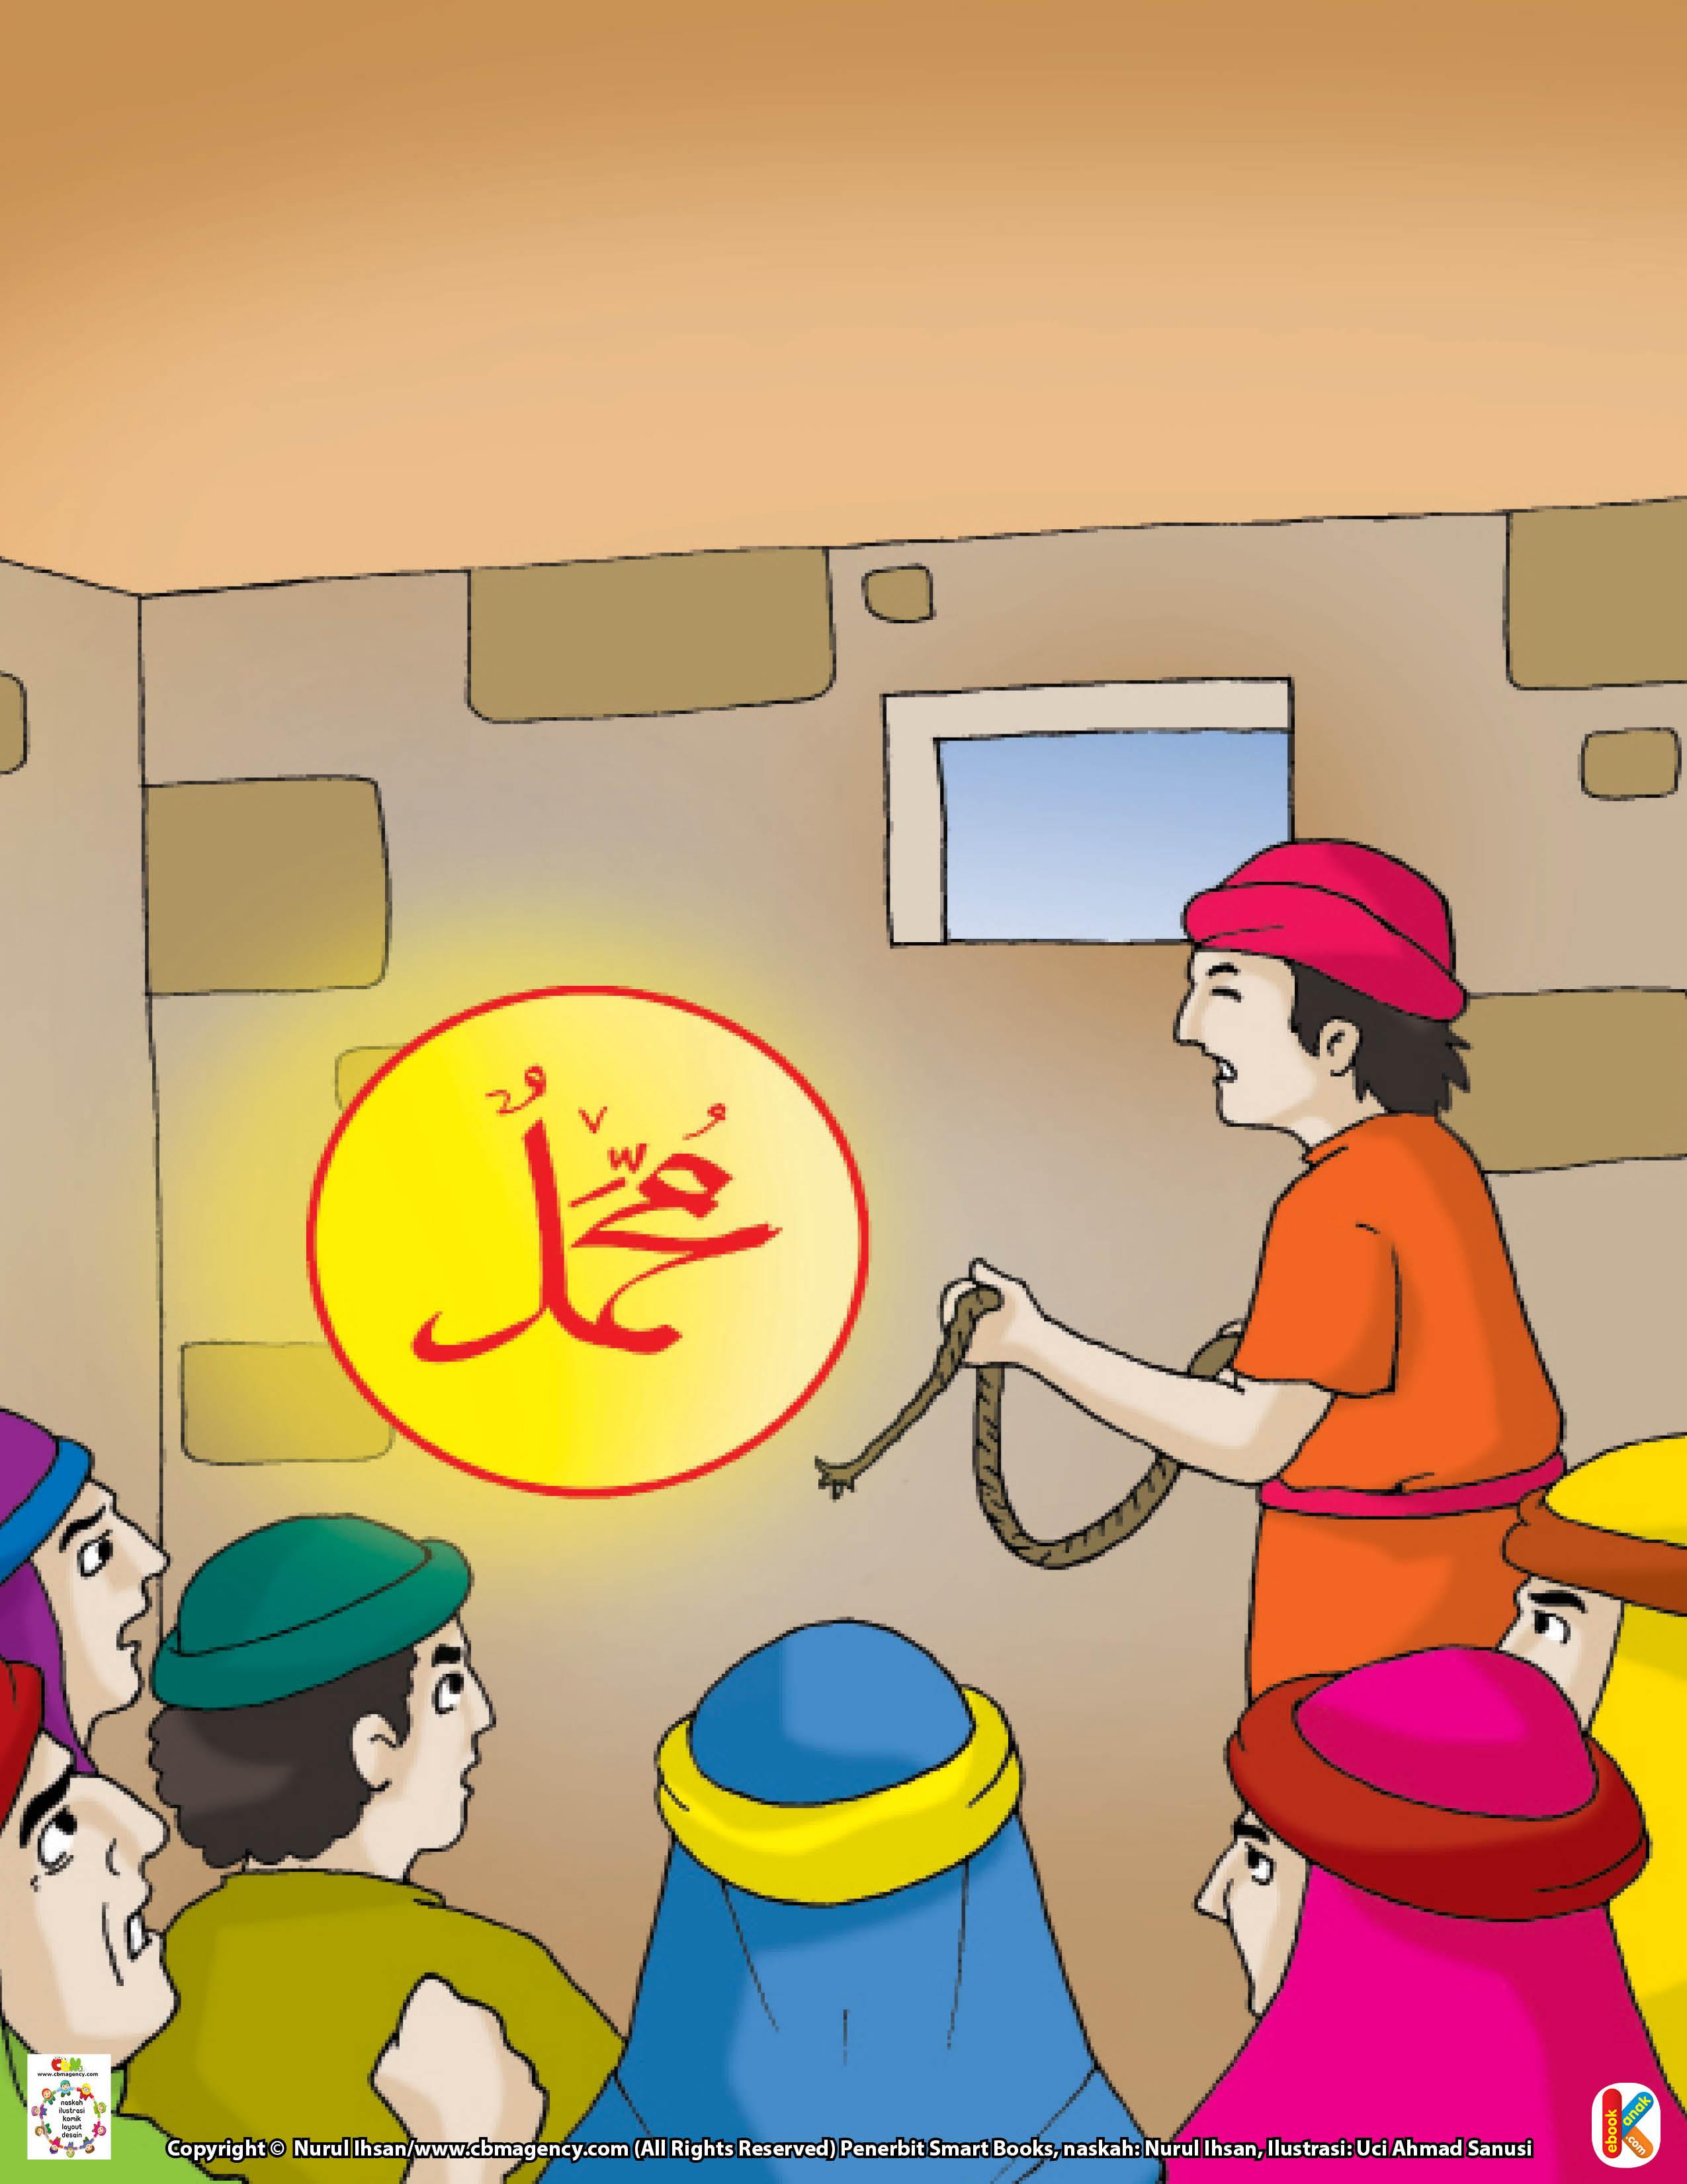 Saat itu, tiba-tiba muncul Ukasyah bin Muhsin.